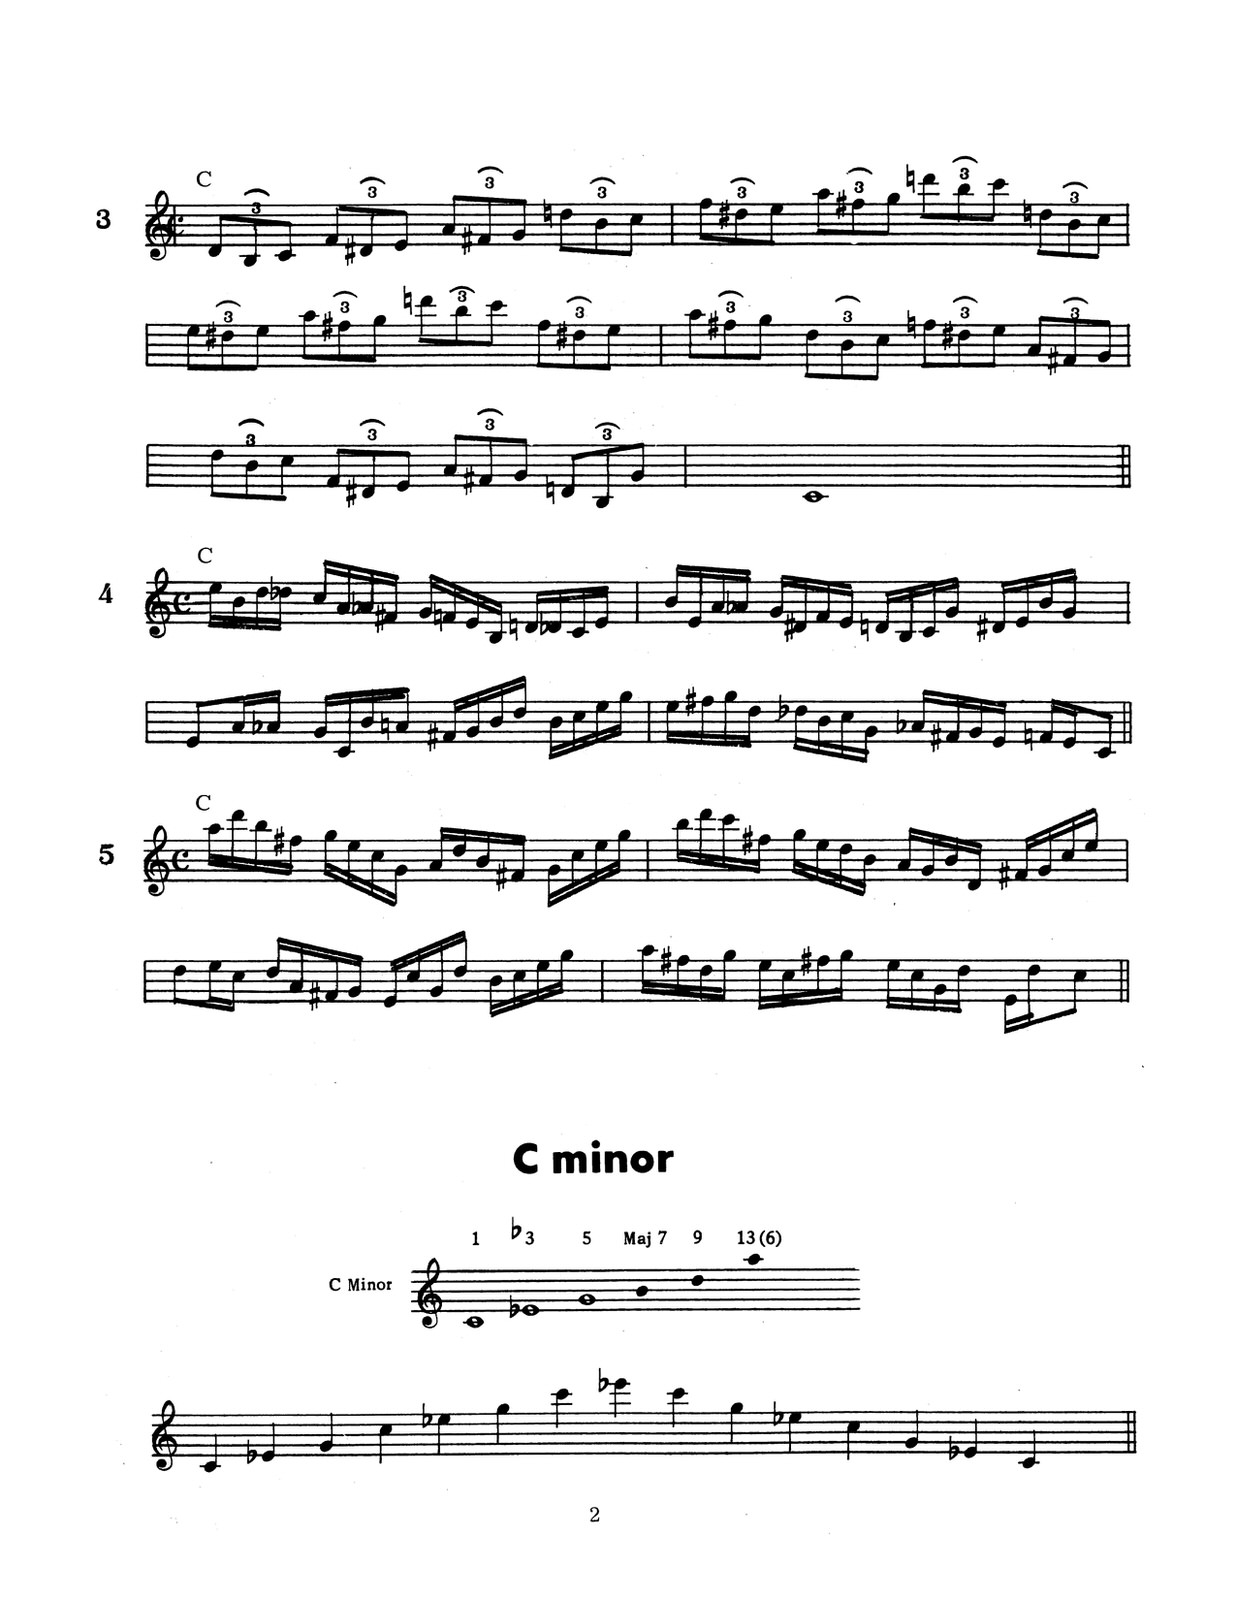 Kotwica, Viola, Chord Studies for Trumpet-p008